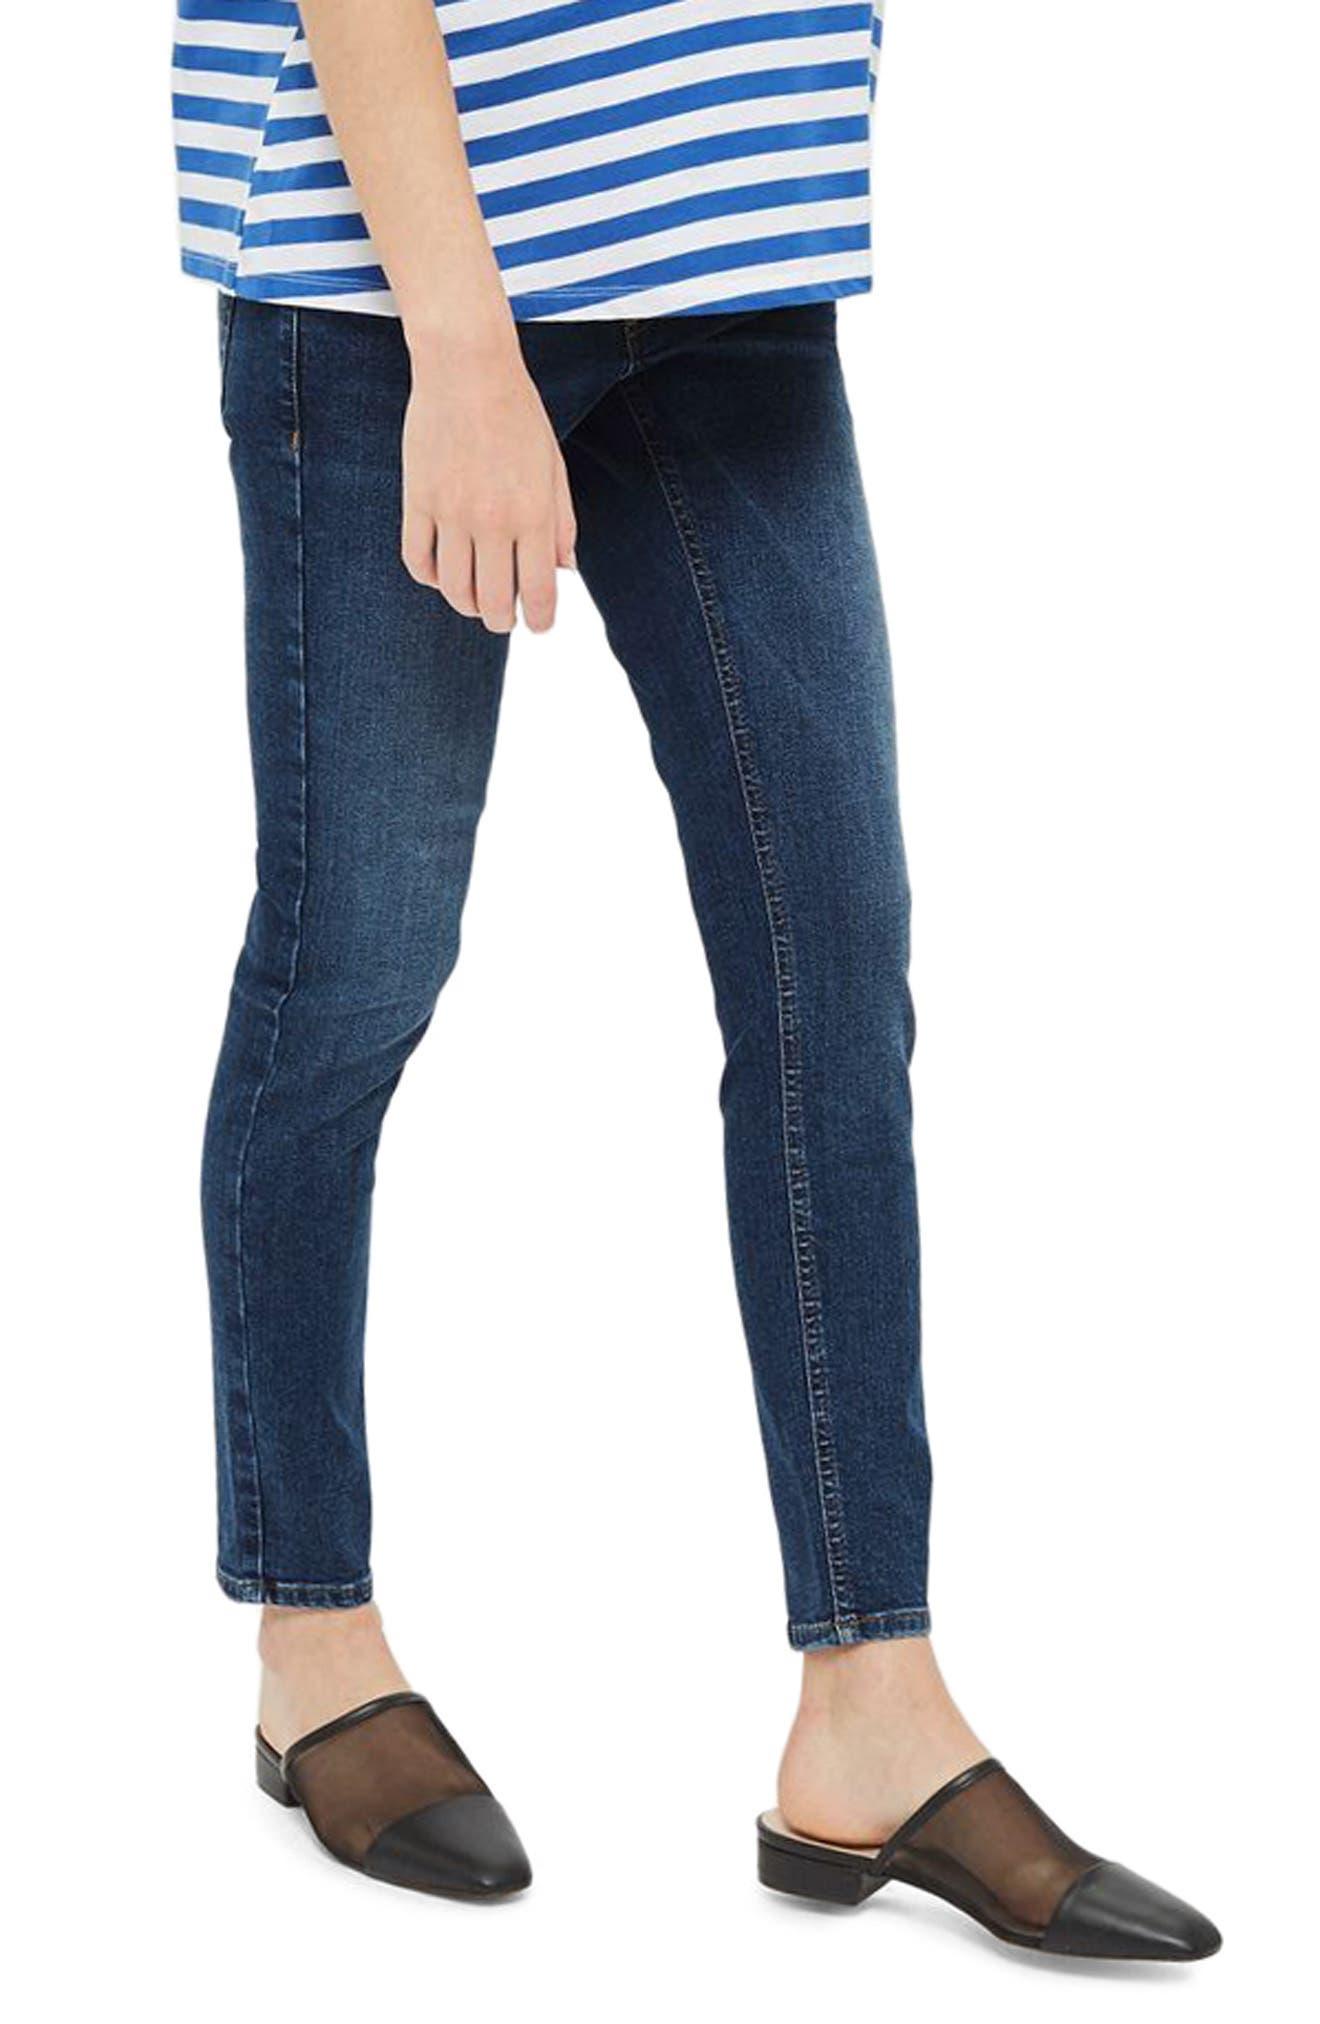 Jamie Over the Bump Maternity Skinny Jeans,                         Main,                         color, Mid Denim